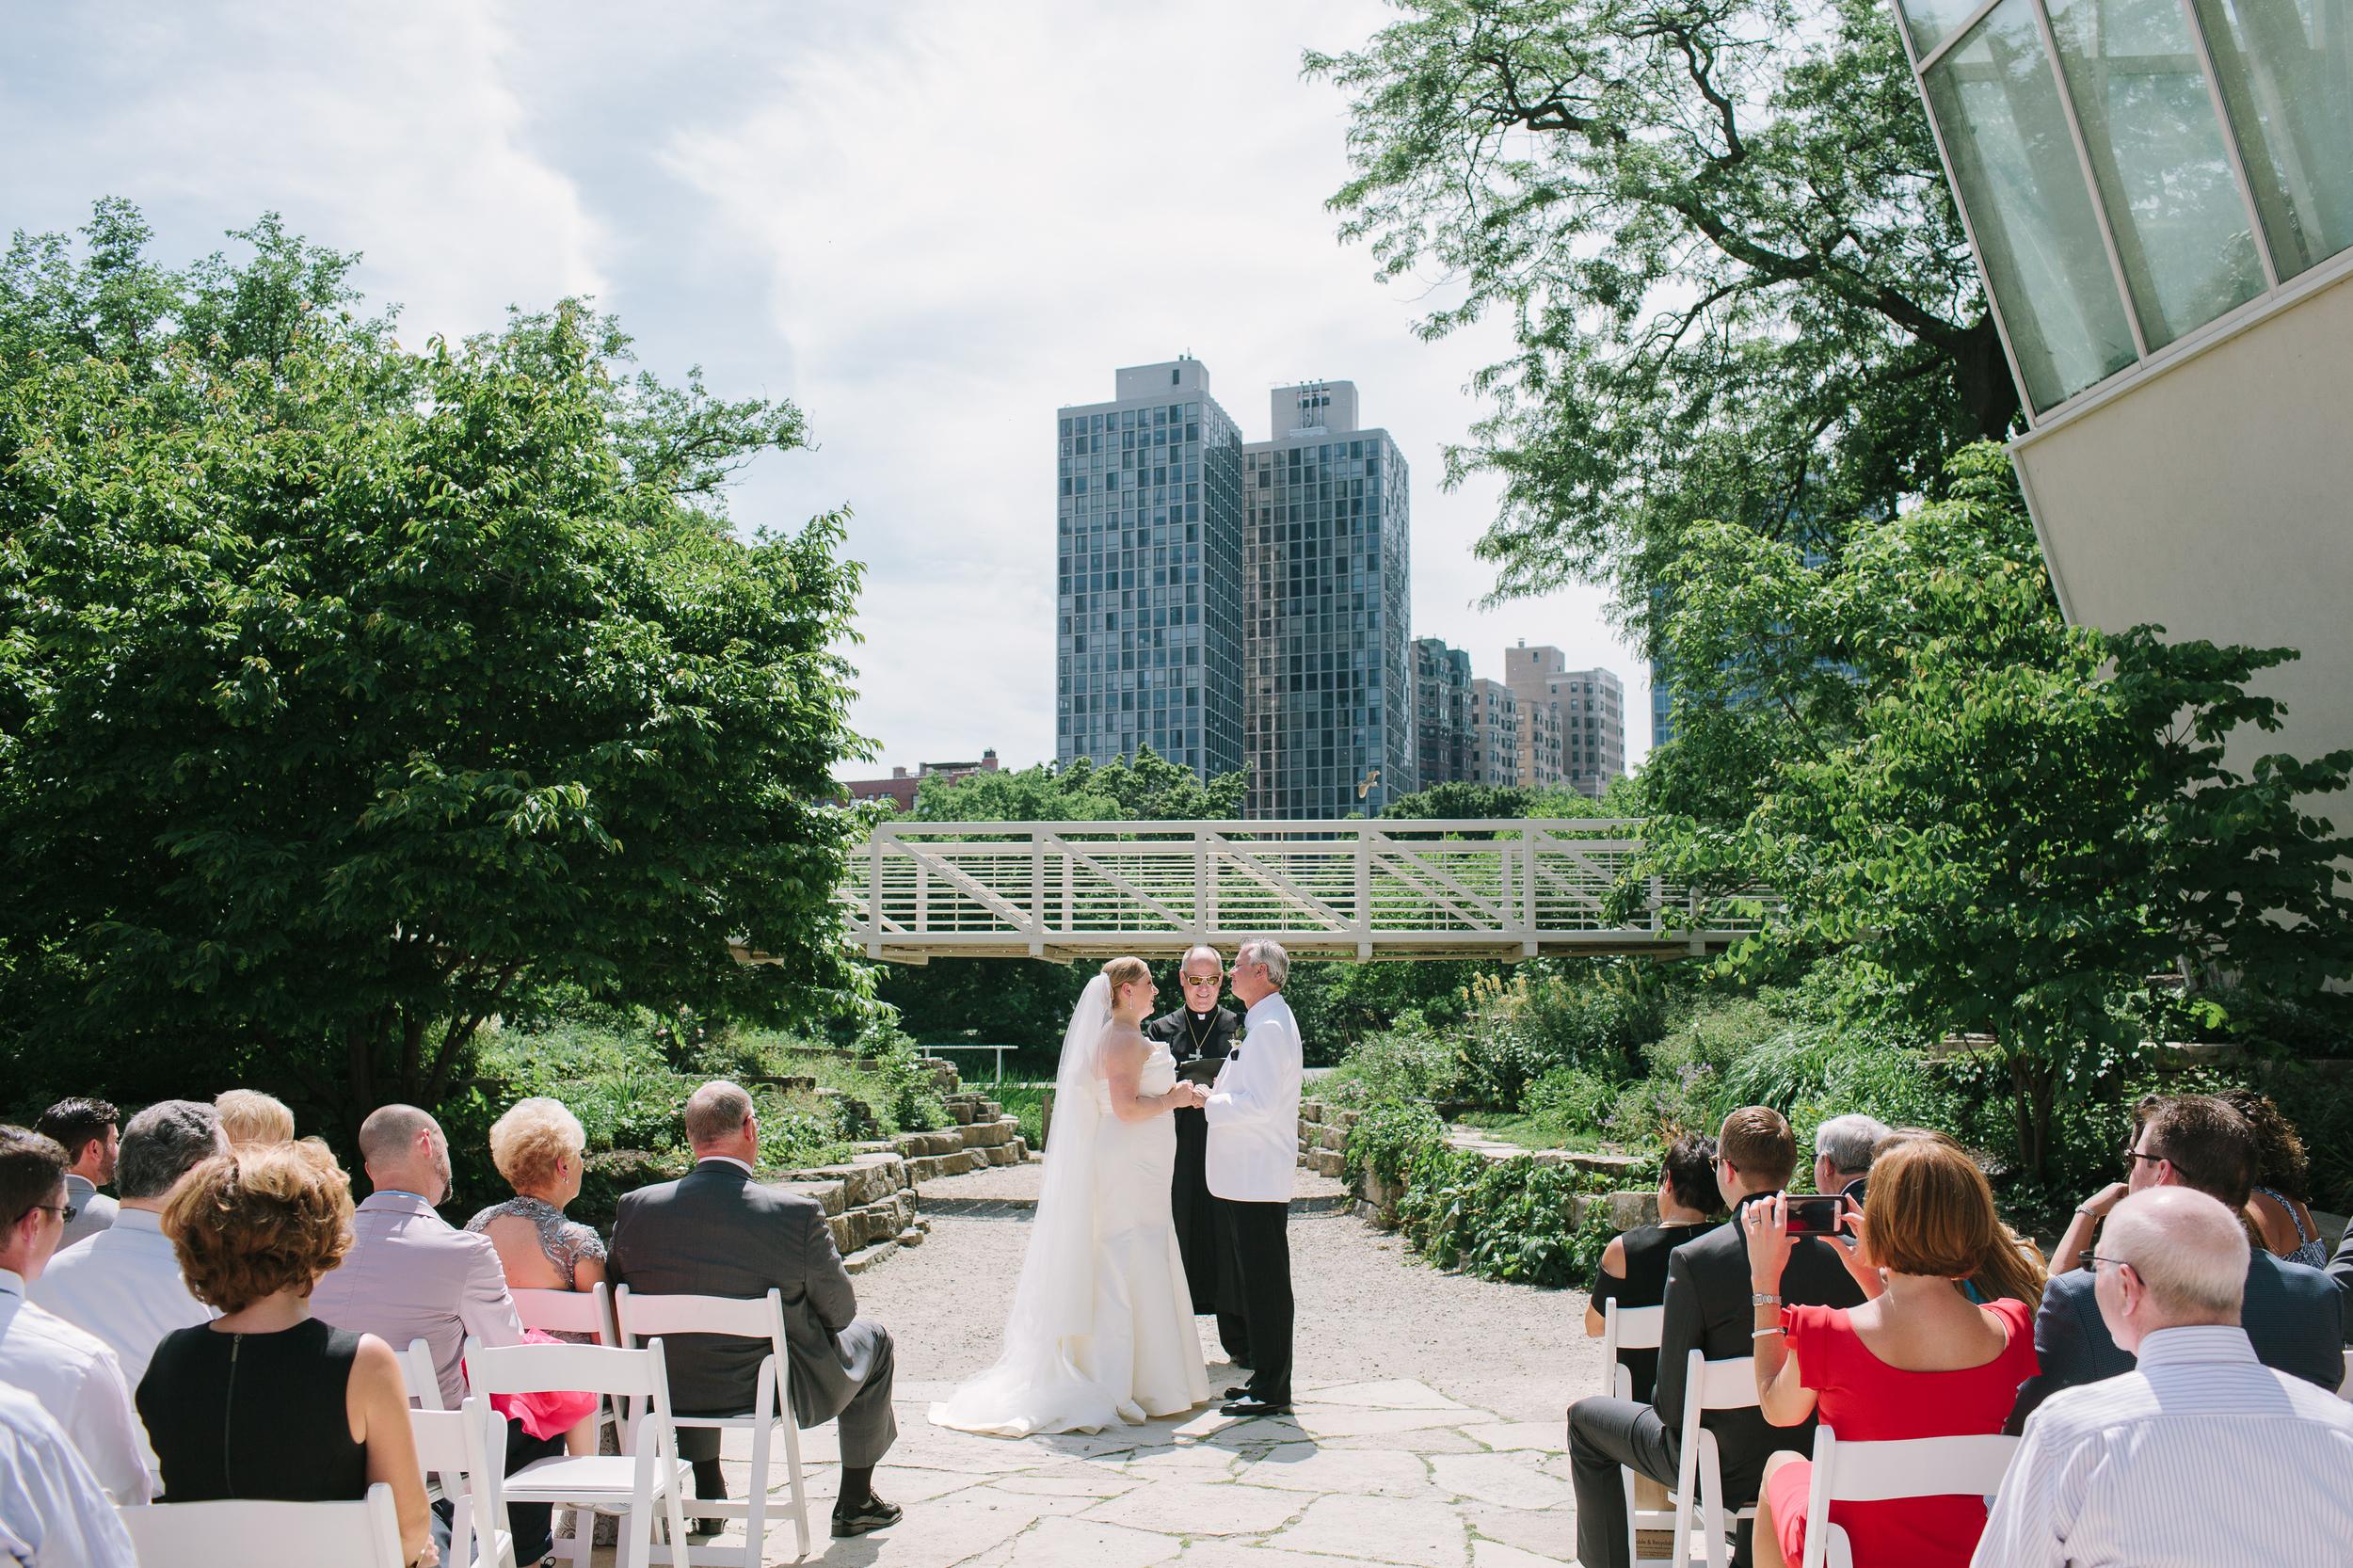 Nicodem Creative_Kokonas Wedding_North Pond Chicago-10.jpg